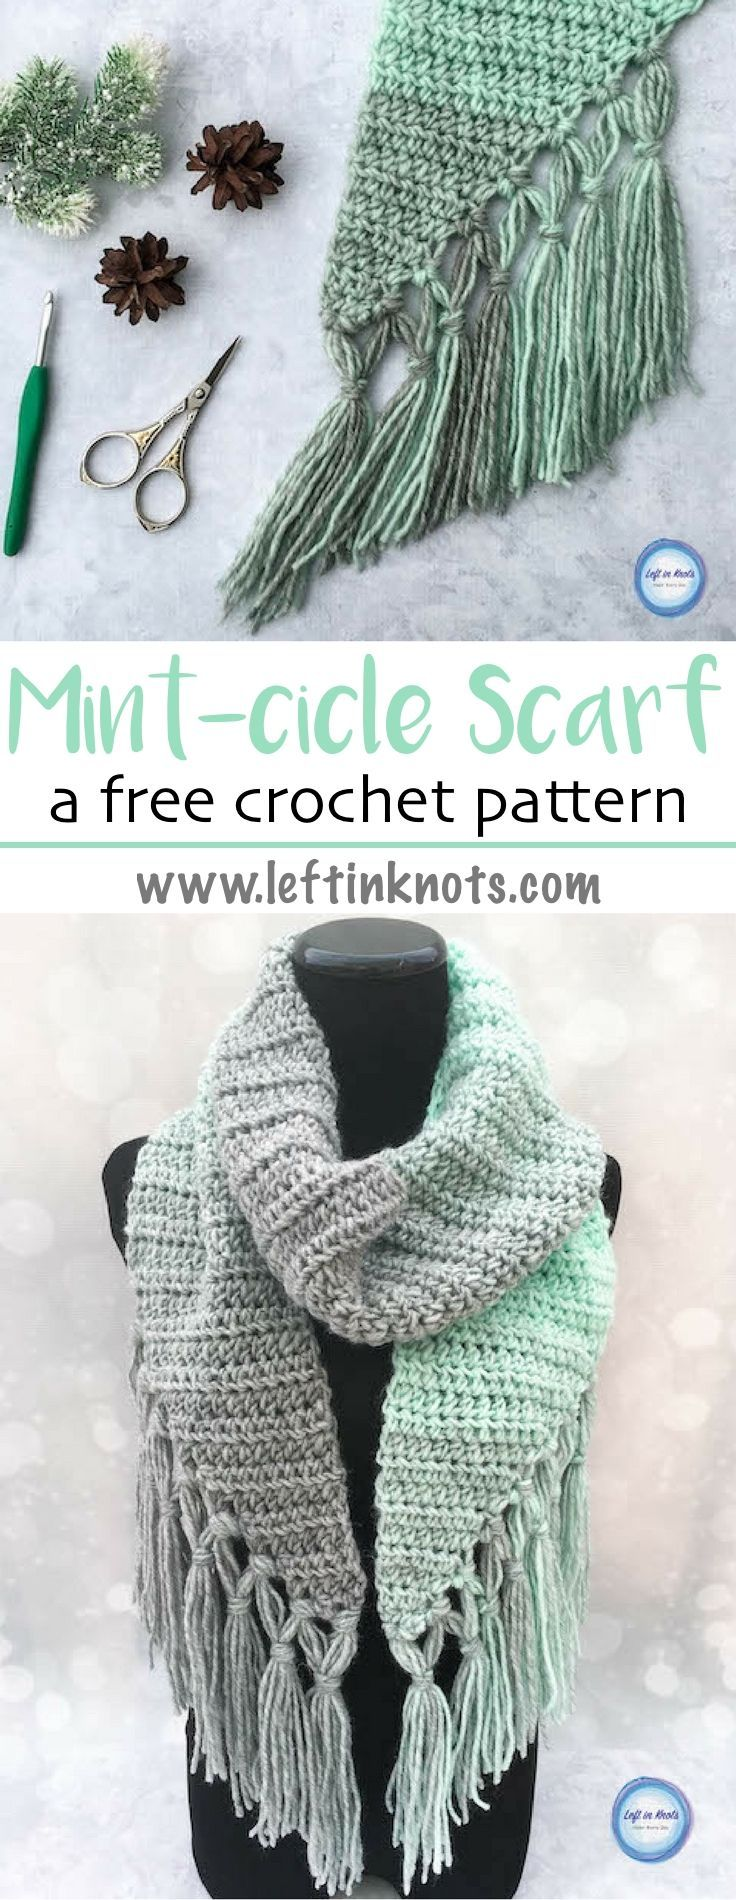 Mint-cicle Scarf Crochet Pattern | Tejido, Chal y Chal de ganchillo